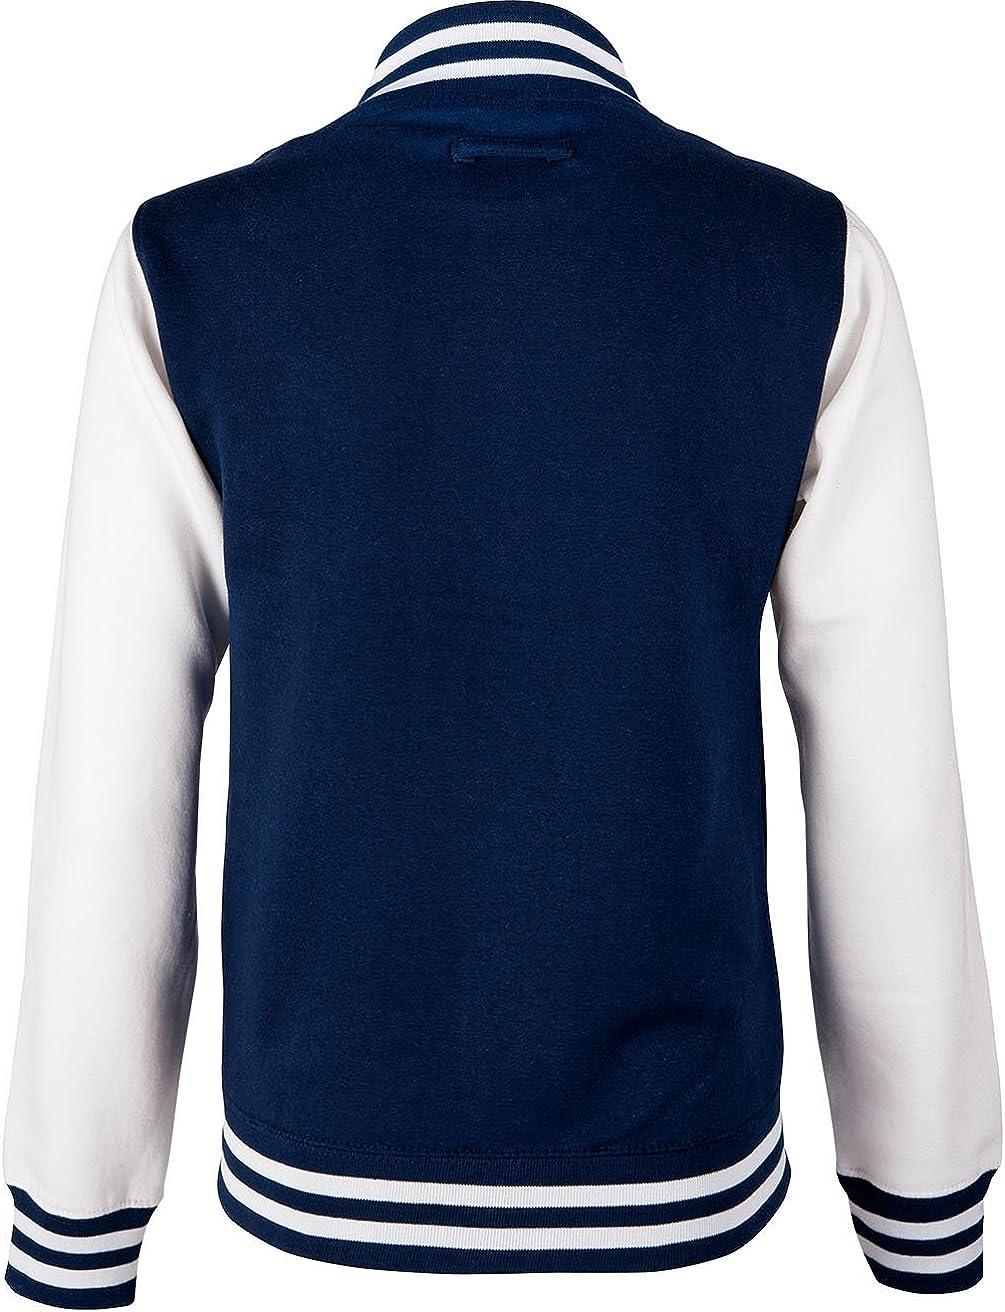 Kinder Herren EZYshirt/® Wunschinitalen Wunschnummer College Jacke f/ür Damen